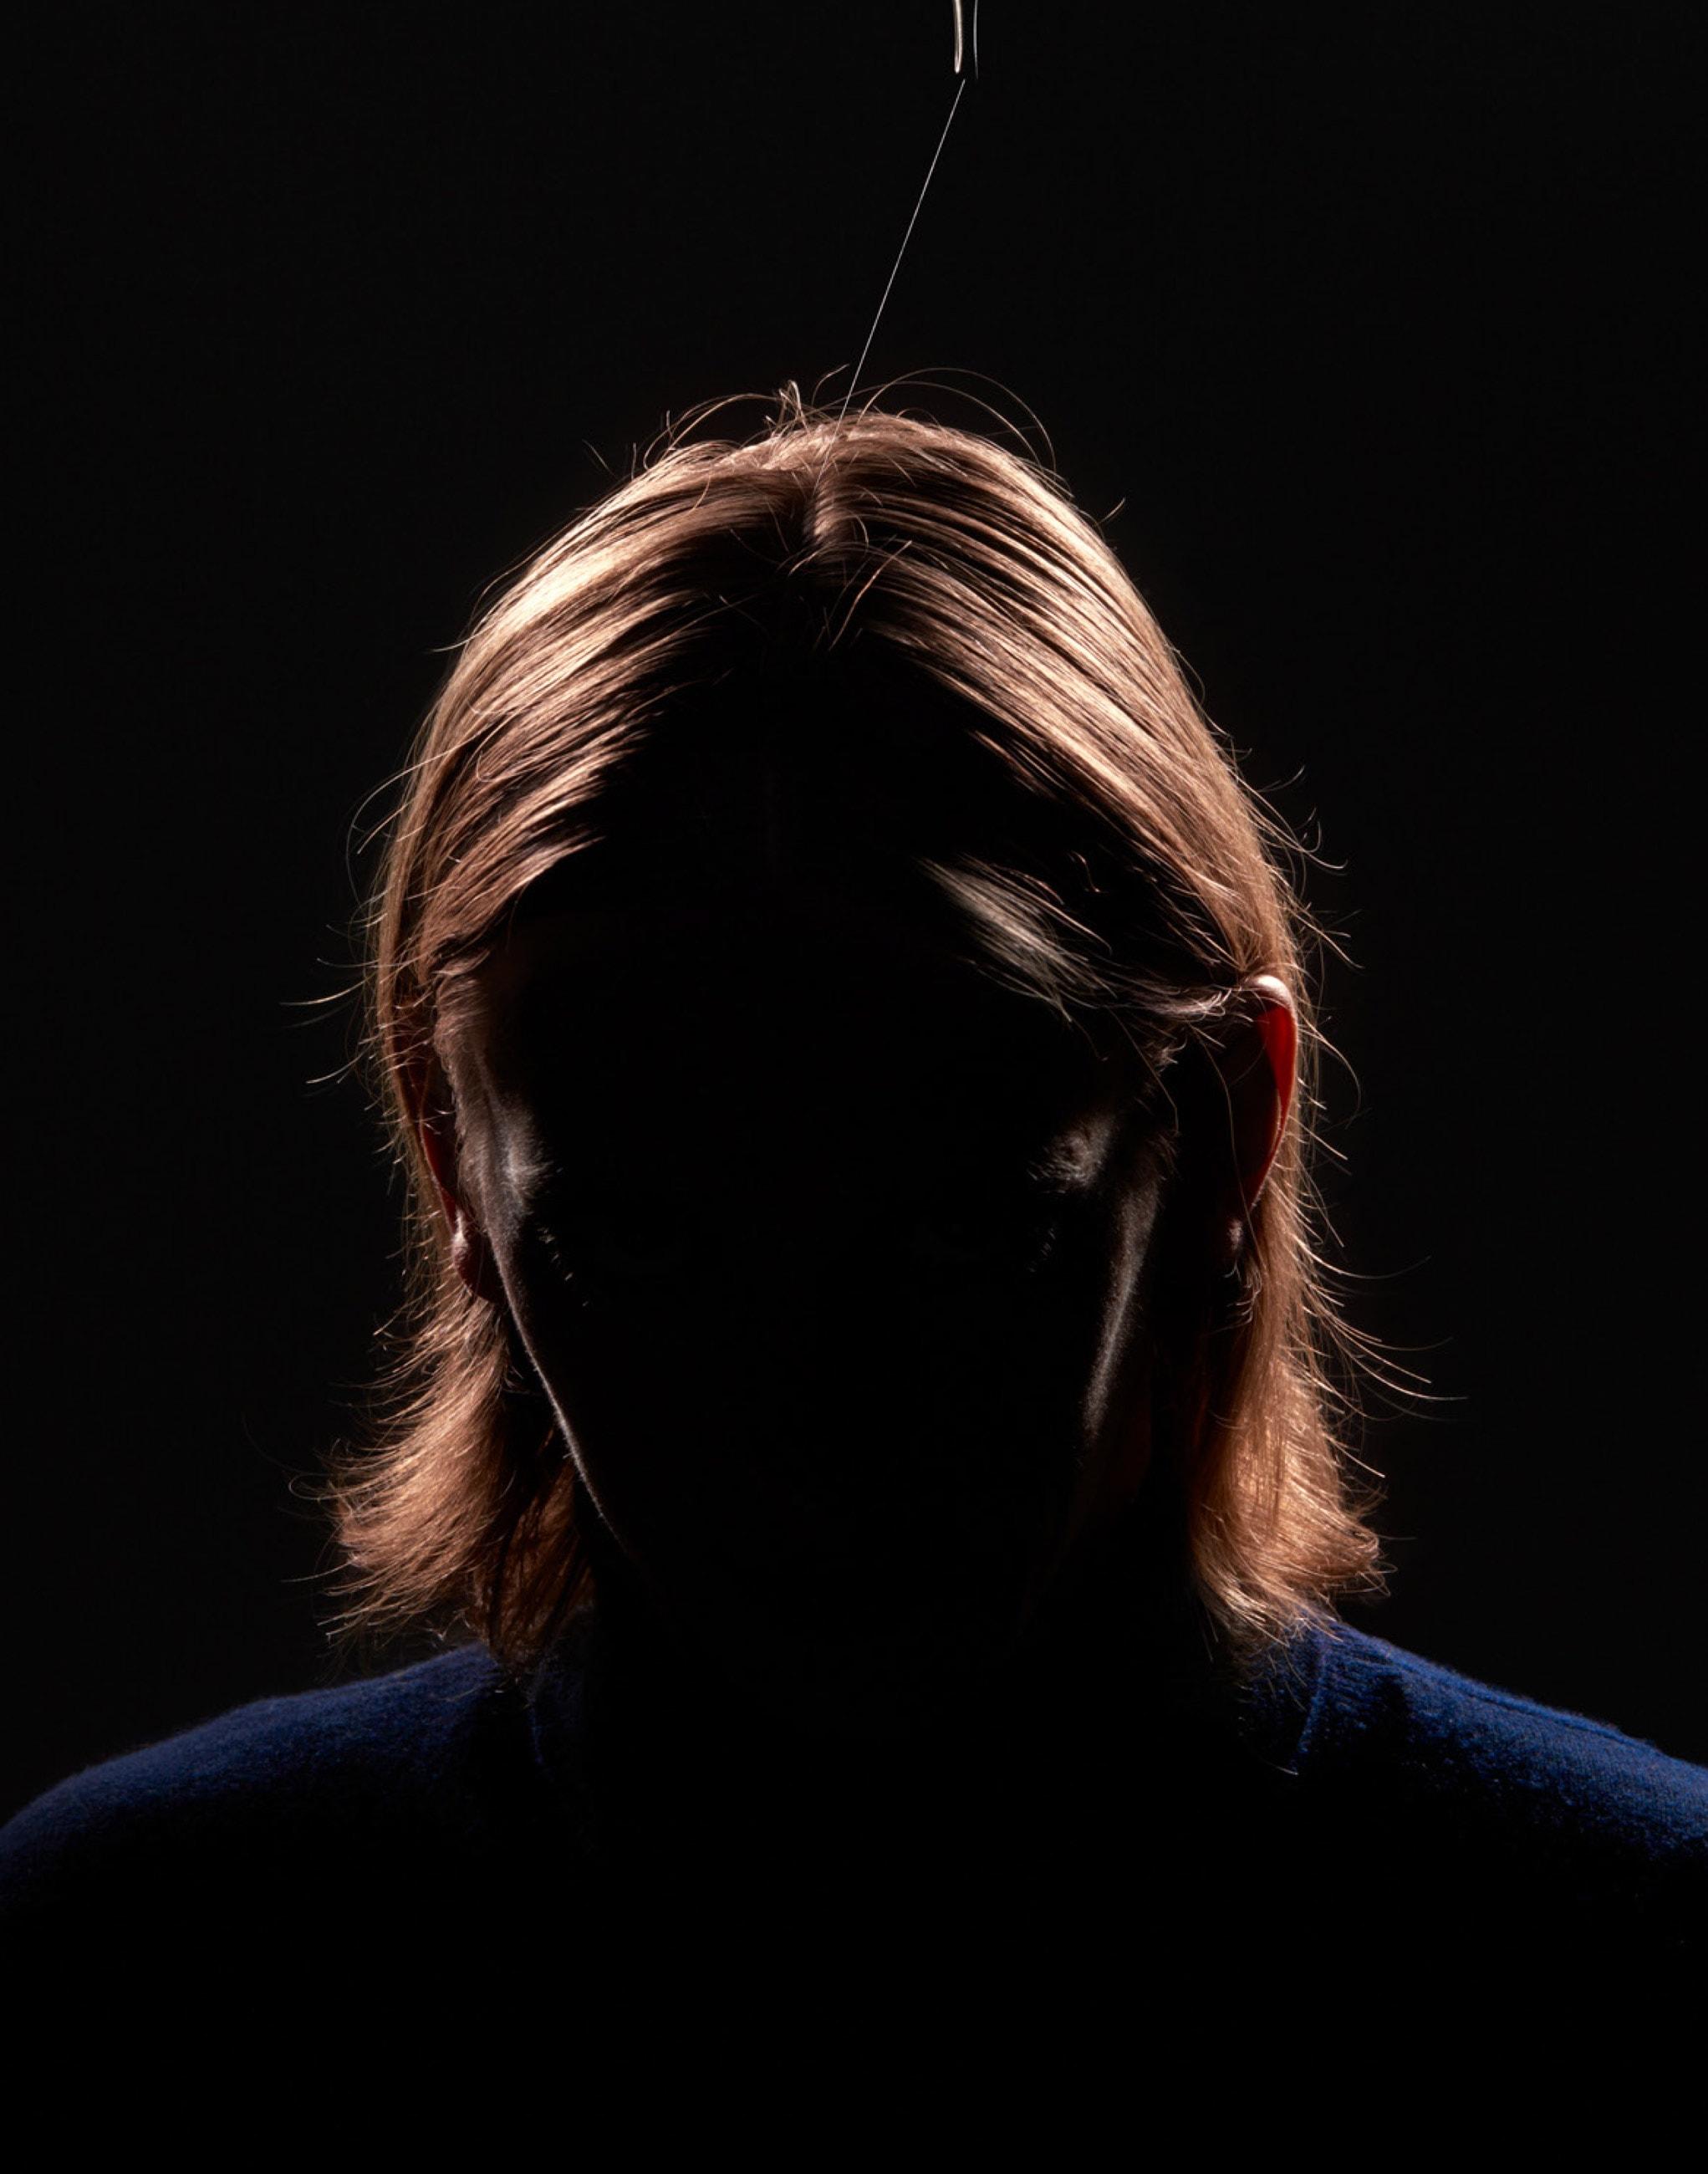 Studio Sander Plug – De Jeugd Van Tegenwoordig - Grey Hairs